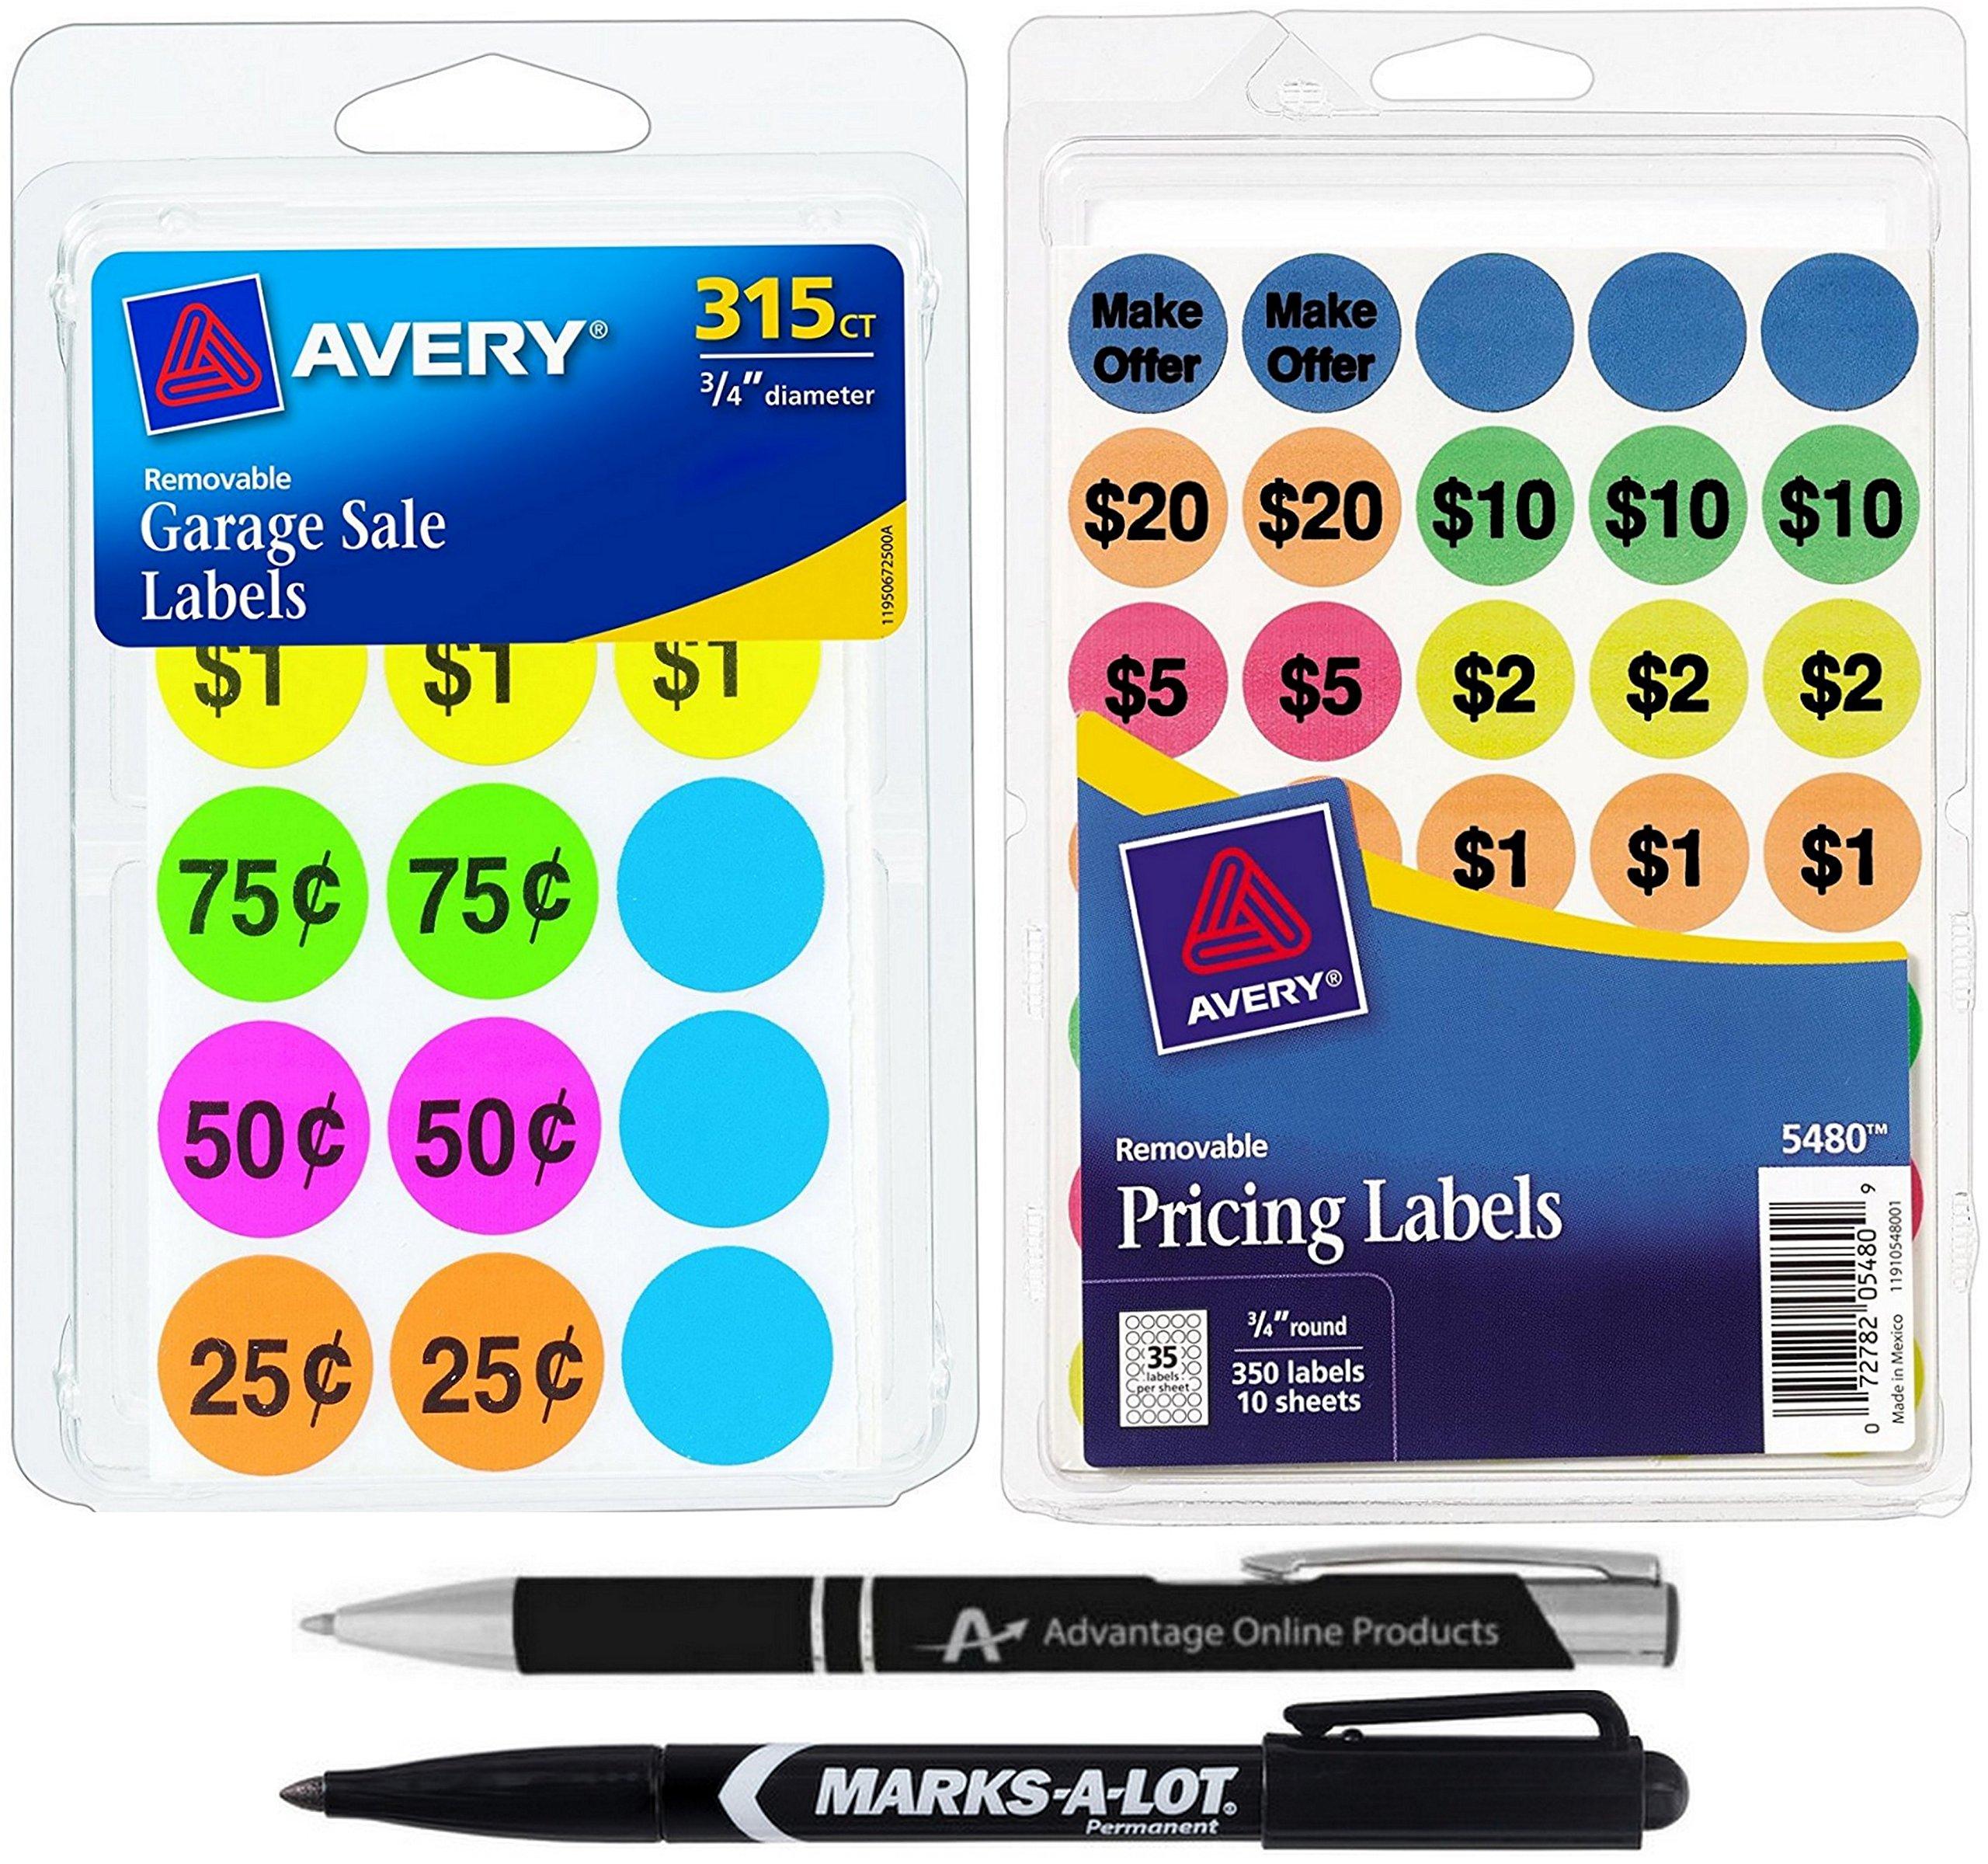 Avery Garage Sale Bundle, Includes 665 Total Pricing Labels, Black Marker for Manual Pricing a Custom AdvantageOP Retractable Ballpoint Pen